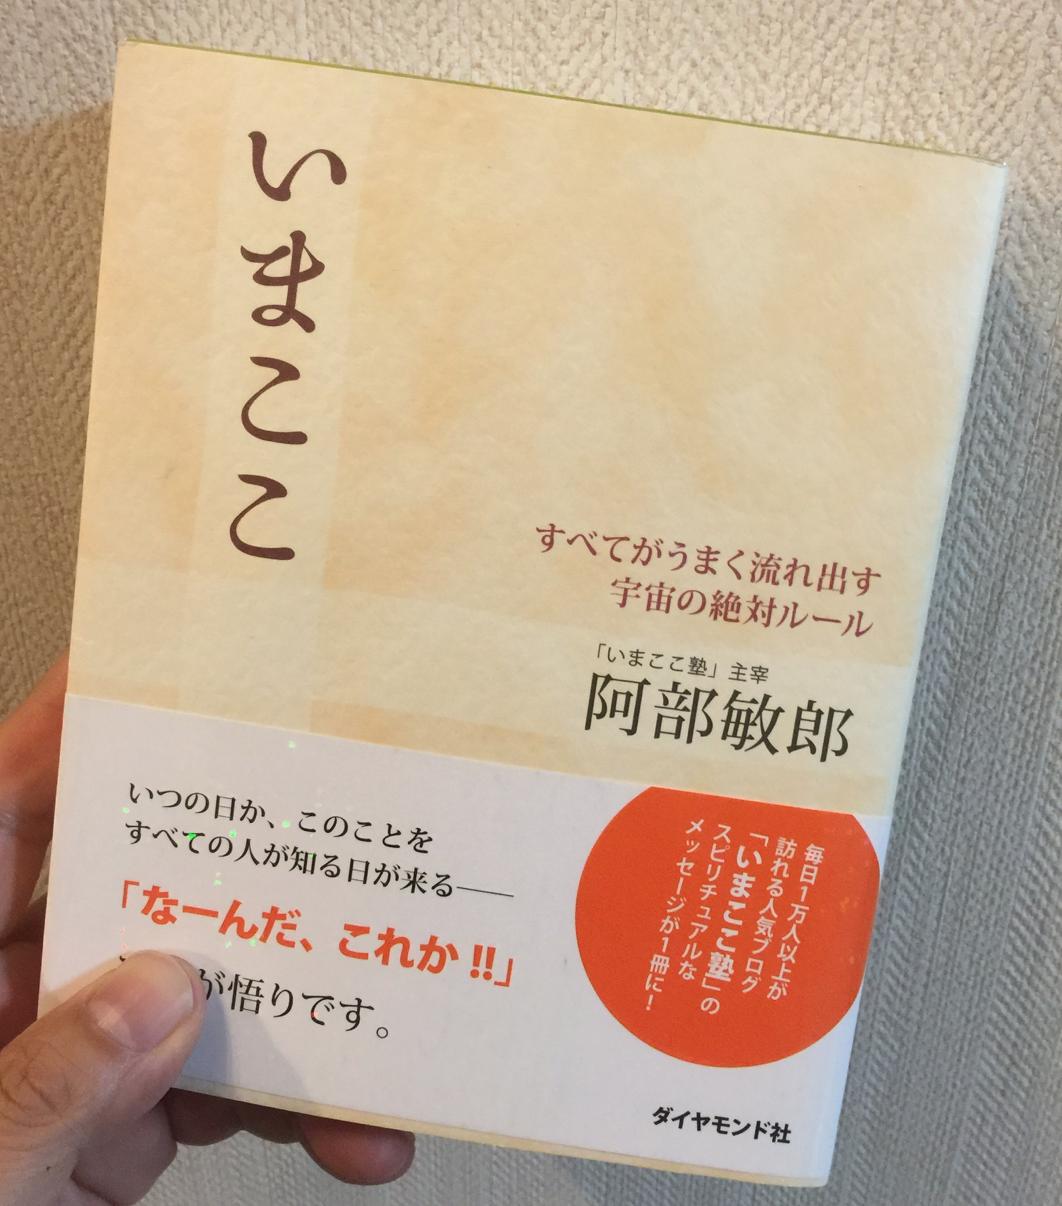 敏郎 ブログ 阿部